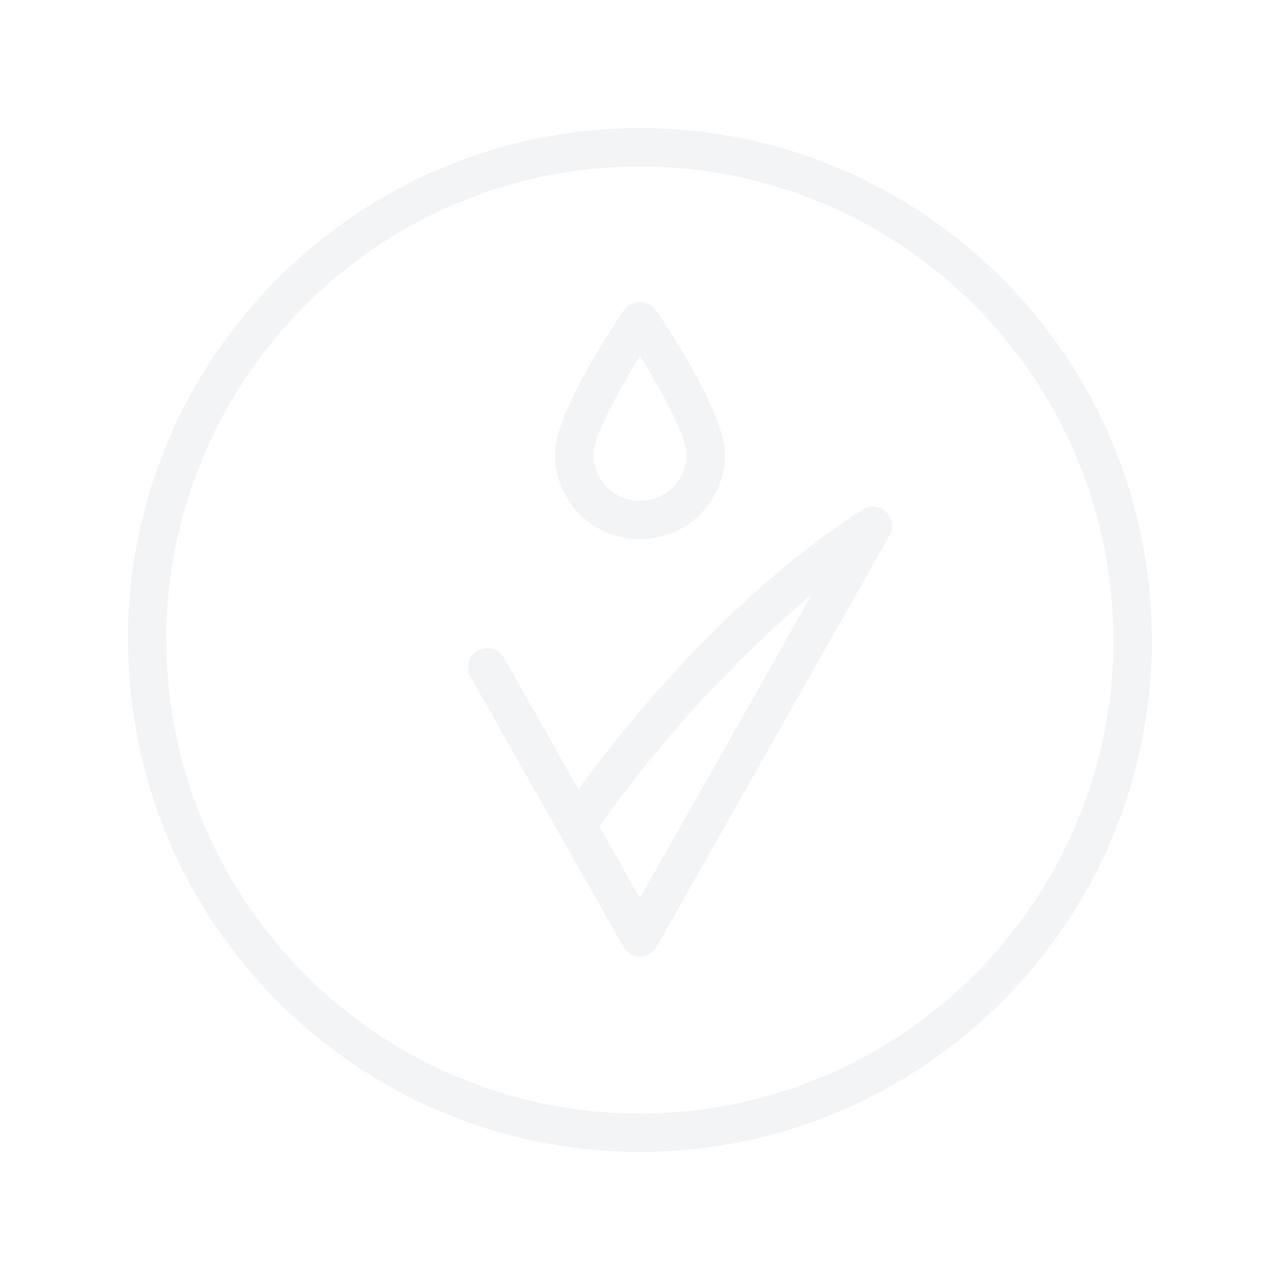 MAKEUP REVOLUTION Beyond Radiance Highlighting Palette 15g